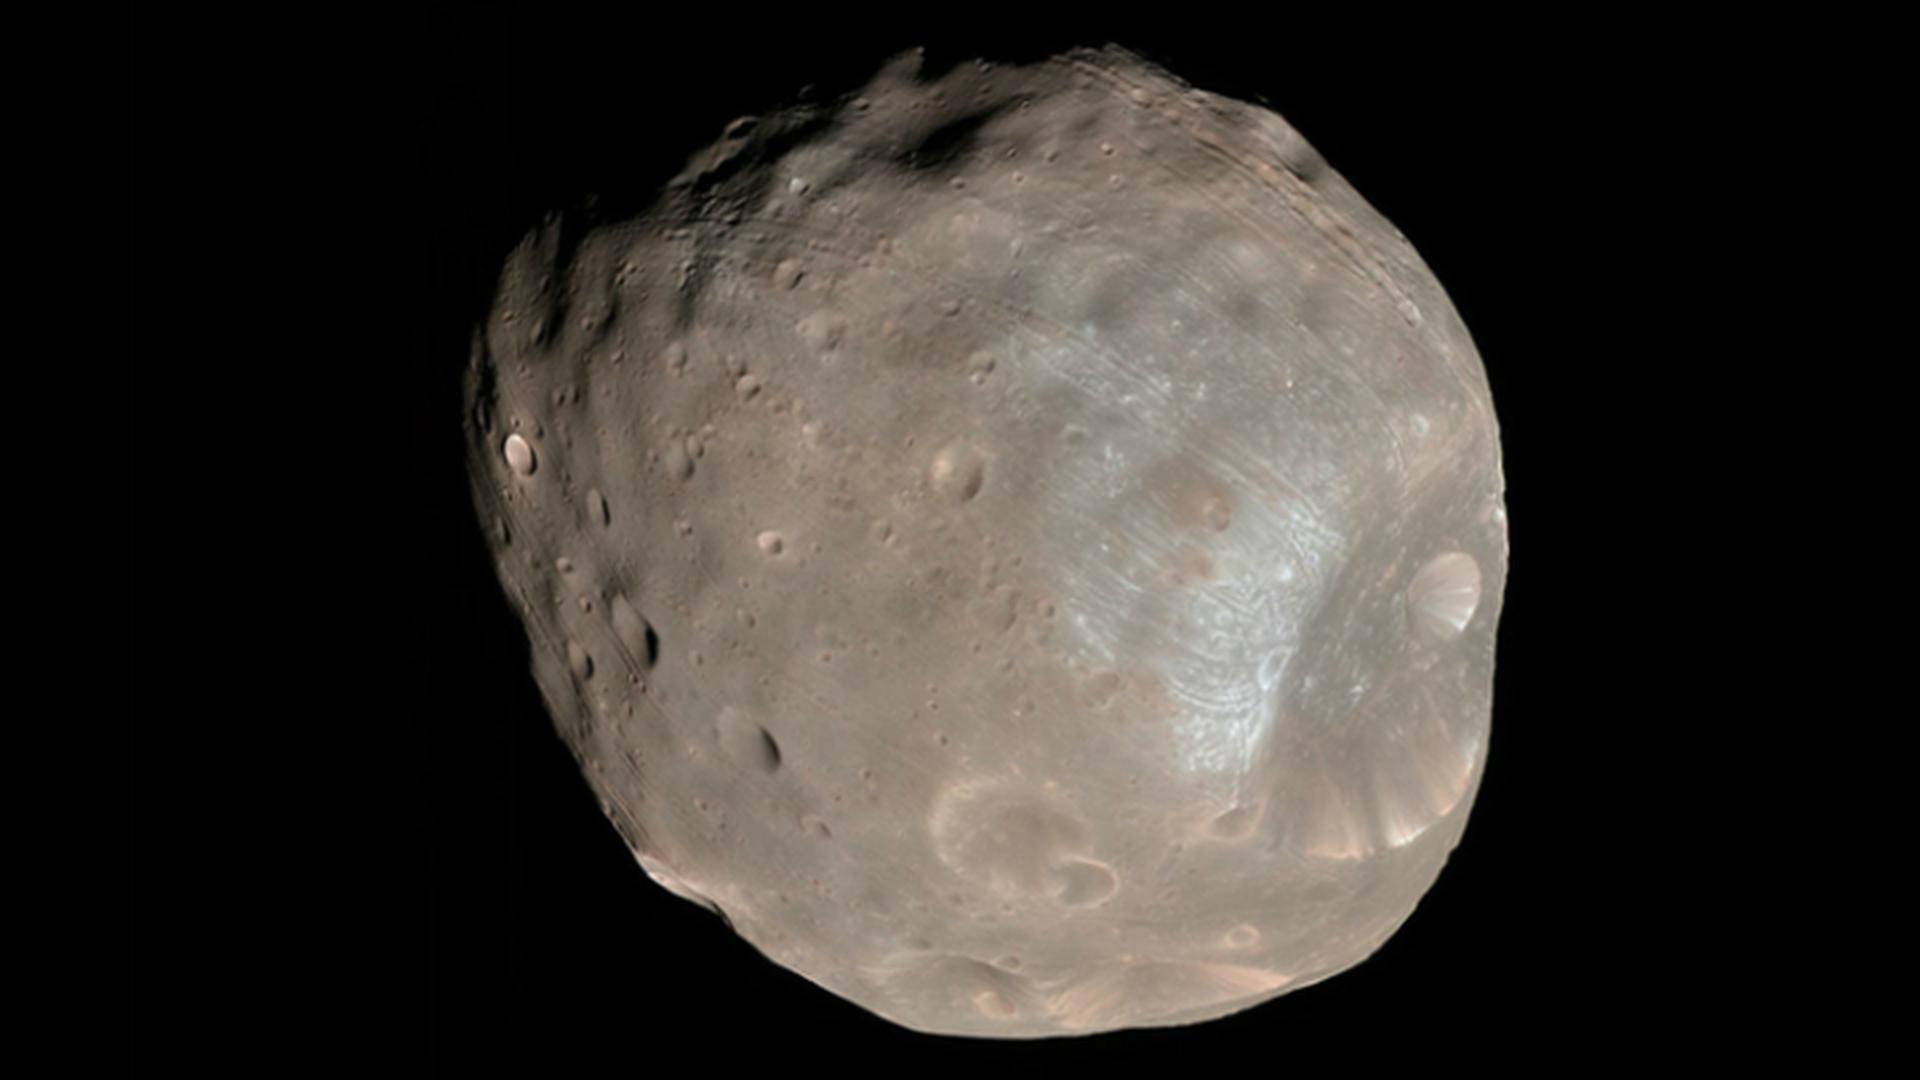 mars moons diameter - HD1920×1080